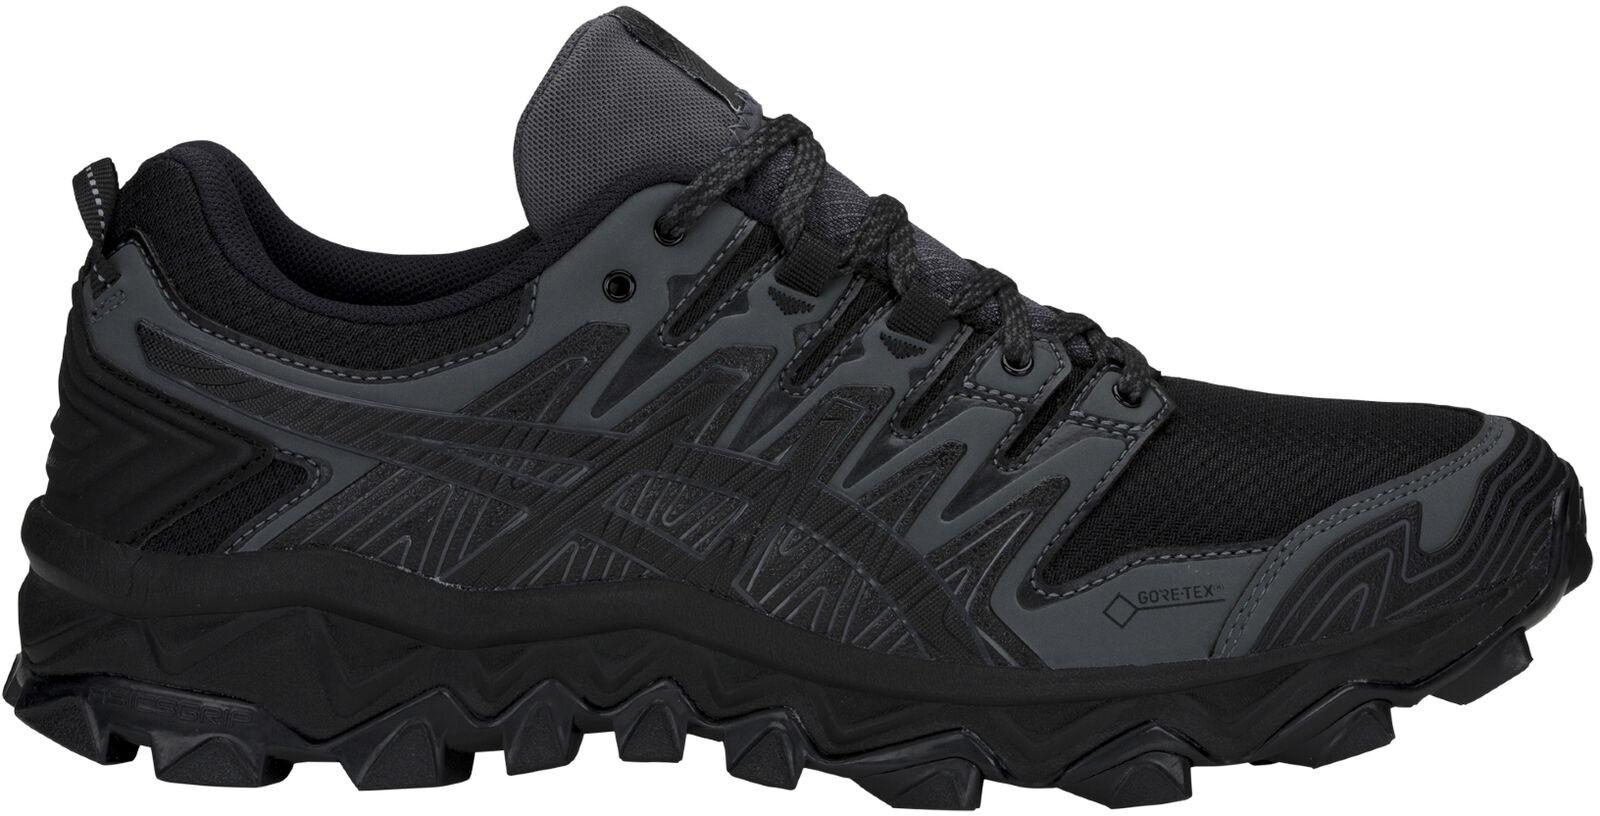 Asics Gel FujiTrabuco 7 GTX mannens Trail hardlopen schoenen --zwart